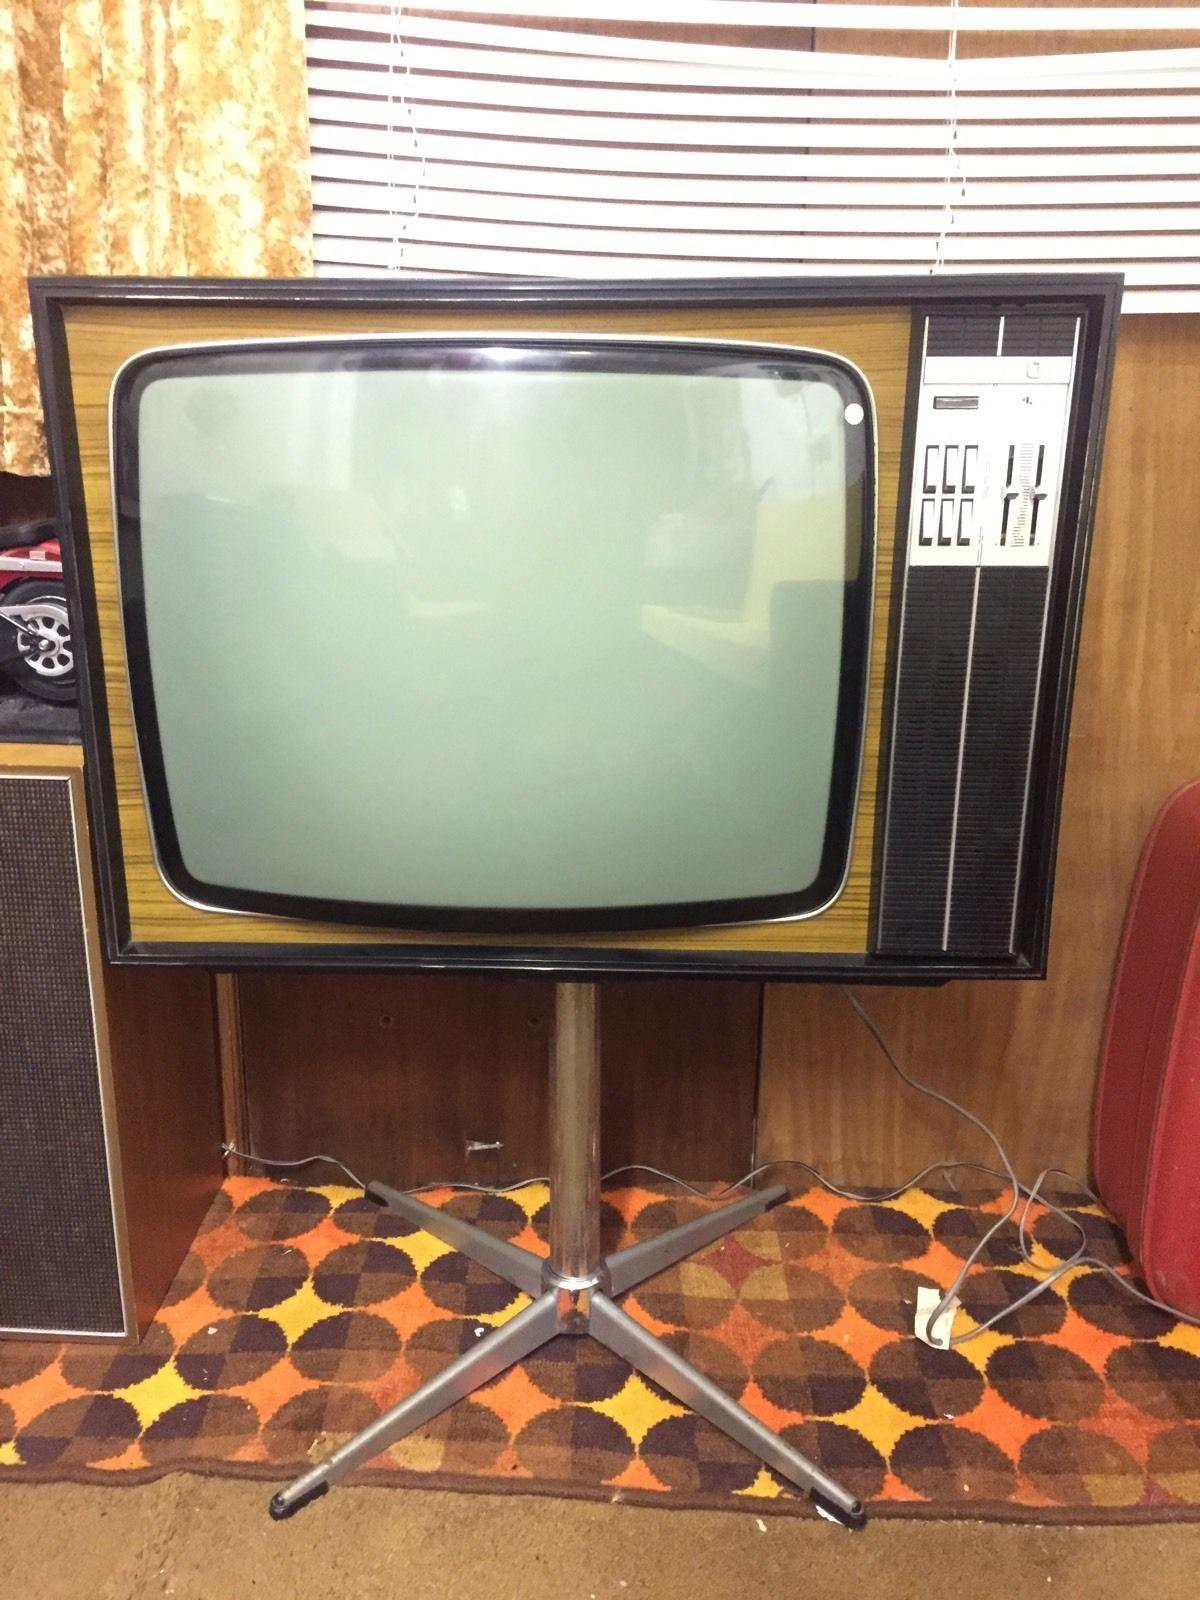 Vintage 1970s Ultra Black And White Television 1 Vintage